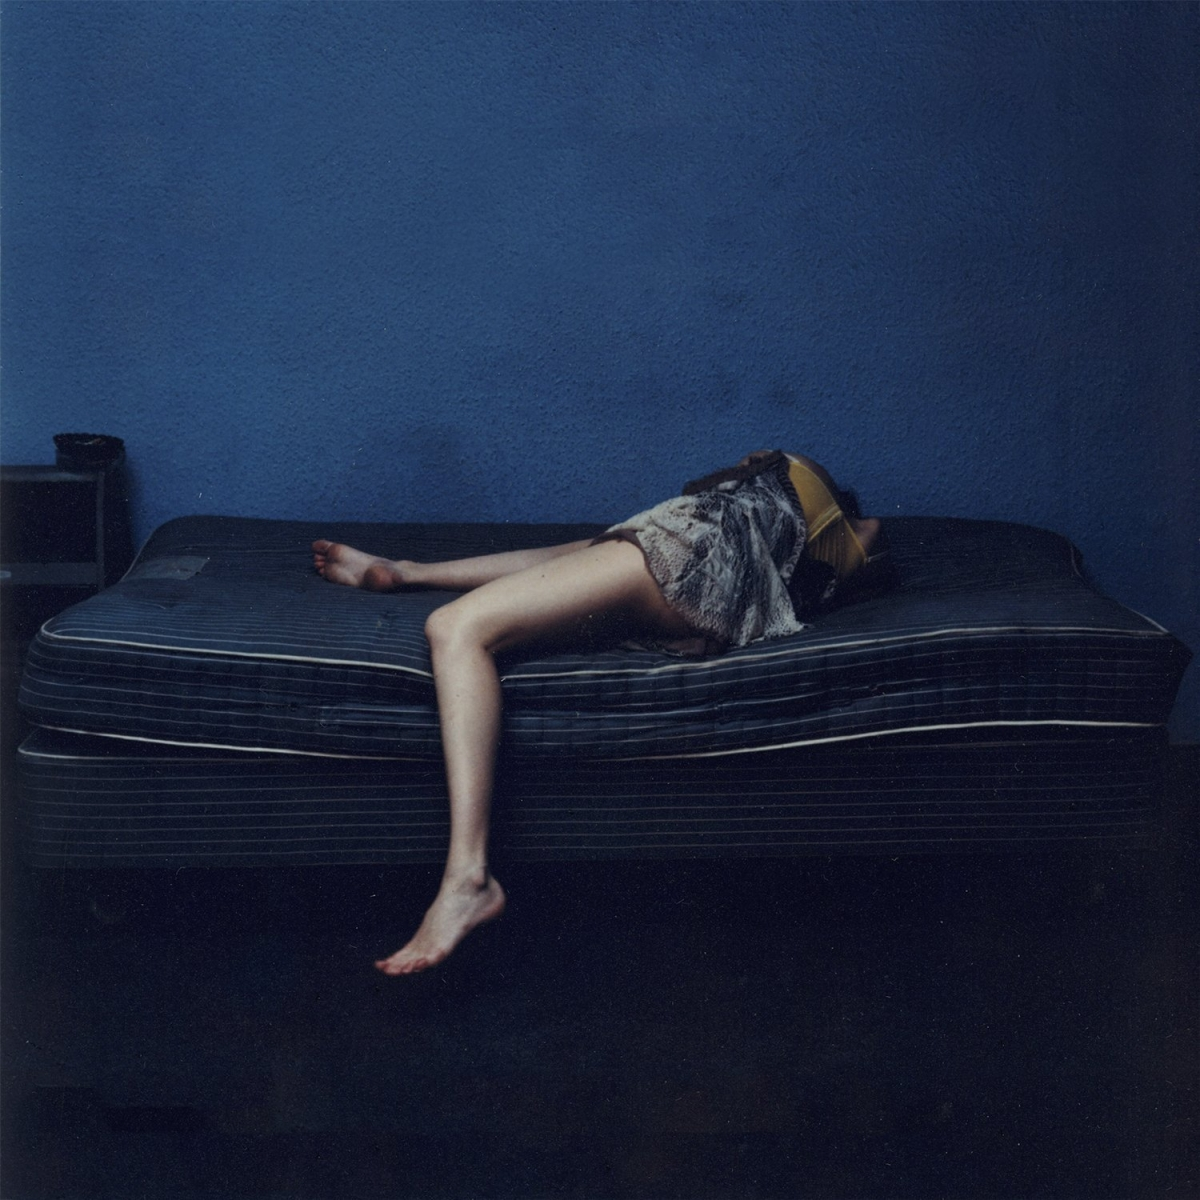 We Slept At Last - CD - Marika Hackman